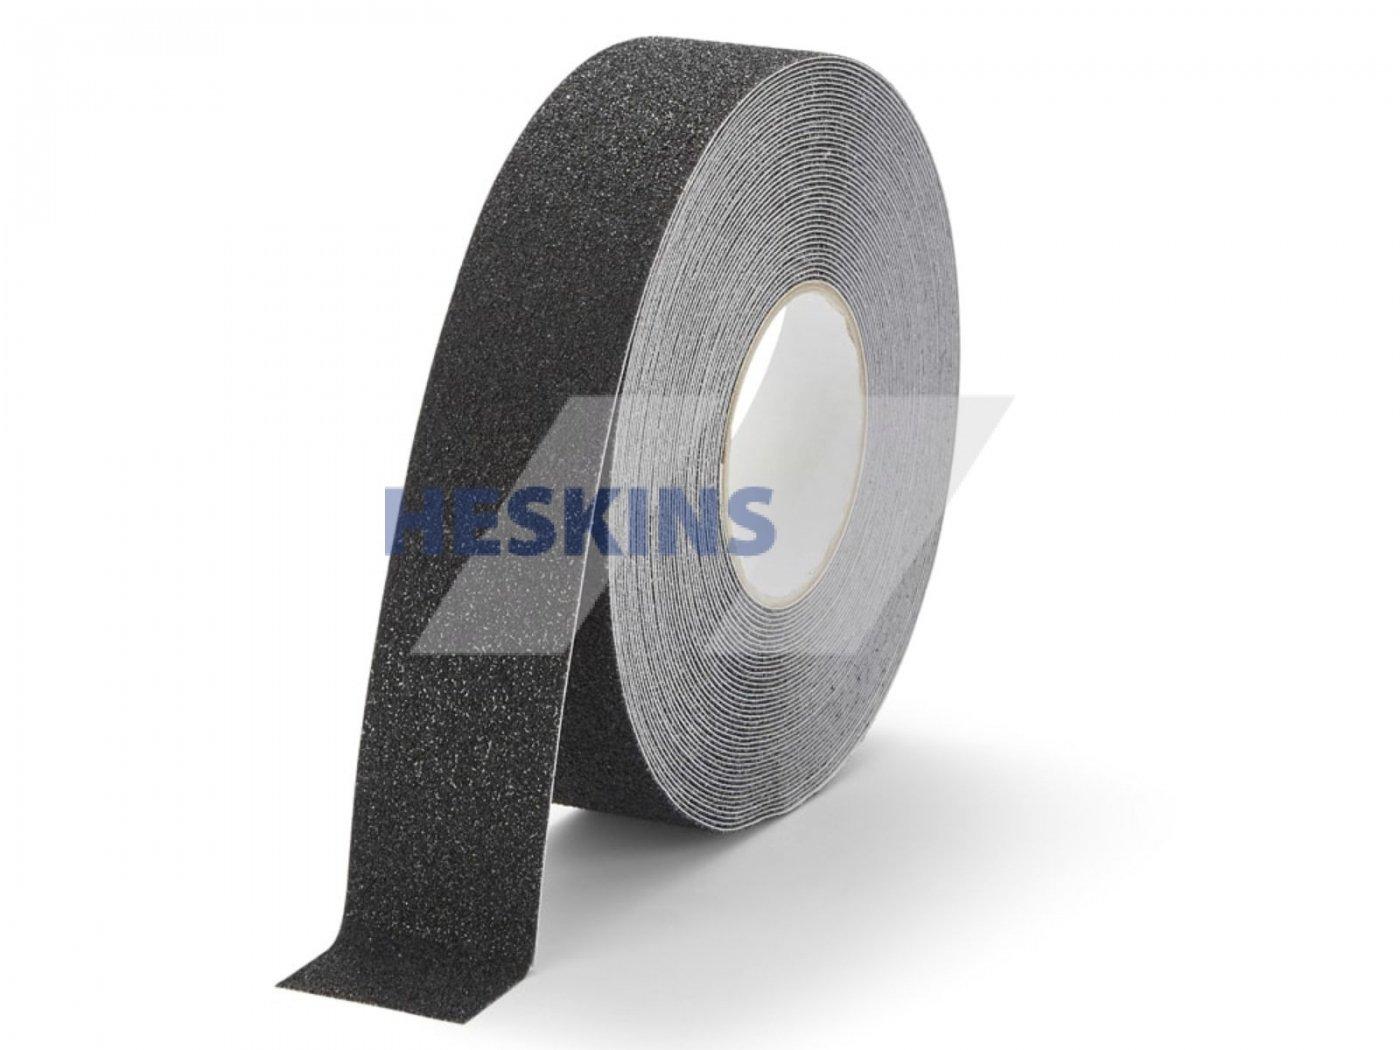 large_554070_h3402n-coarse-safety-grip-black-50mm-web.jpg